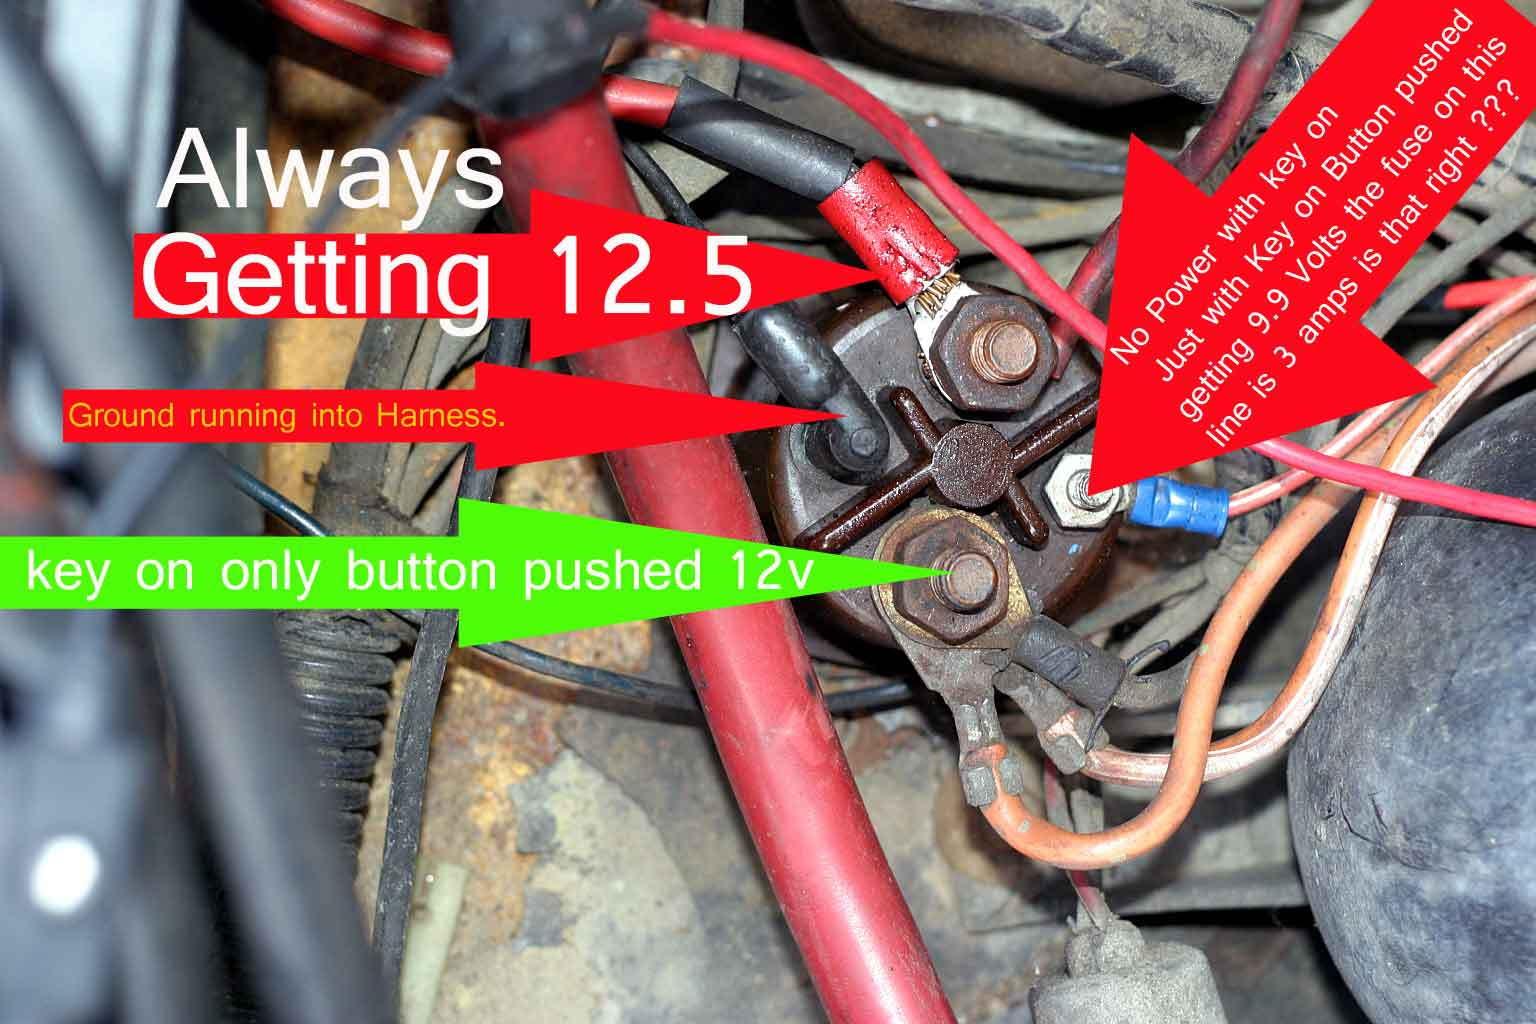 glow plug controller wiring diagram with 7 3 Idi Glow Plug Wiring Diagram on Watch additionally 280051 S420 Cdi Glow Plug Relay Question also Isuzu Npr Truck Wiring Diagram as well 7 3 Powerstroke Block Heater Location additionally 9ed362c3f3bae6d325782d09696484ea.